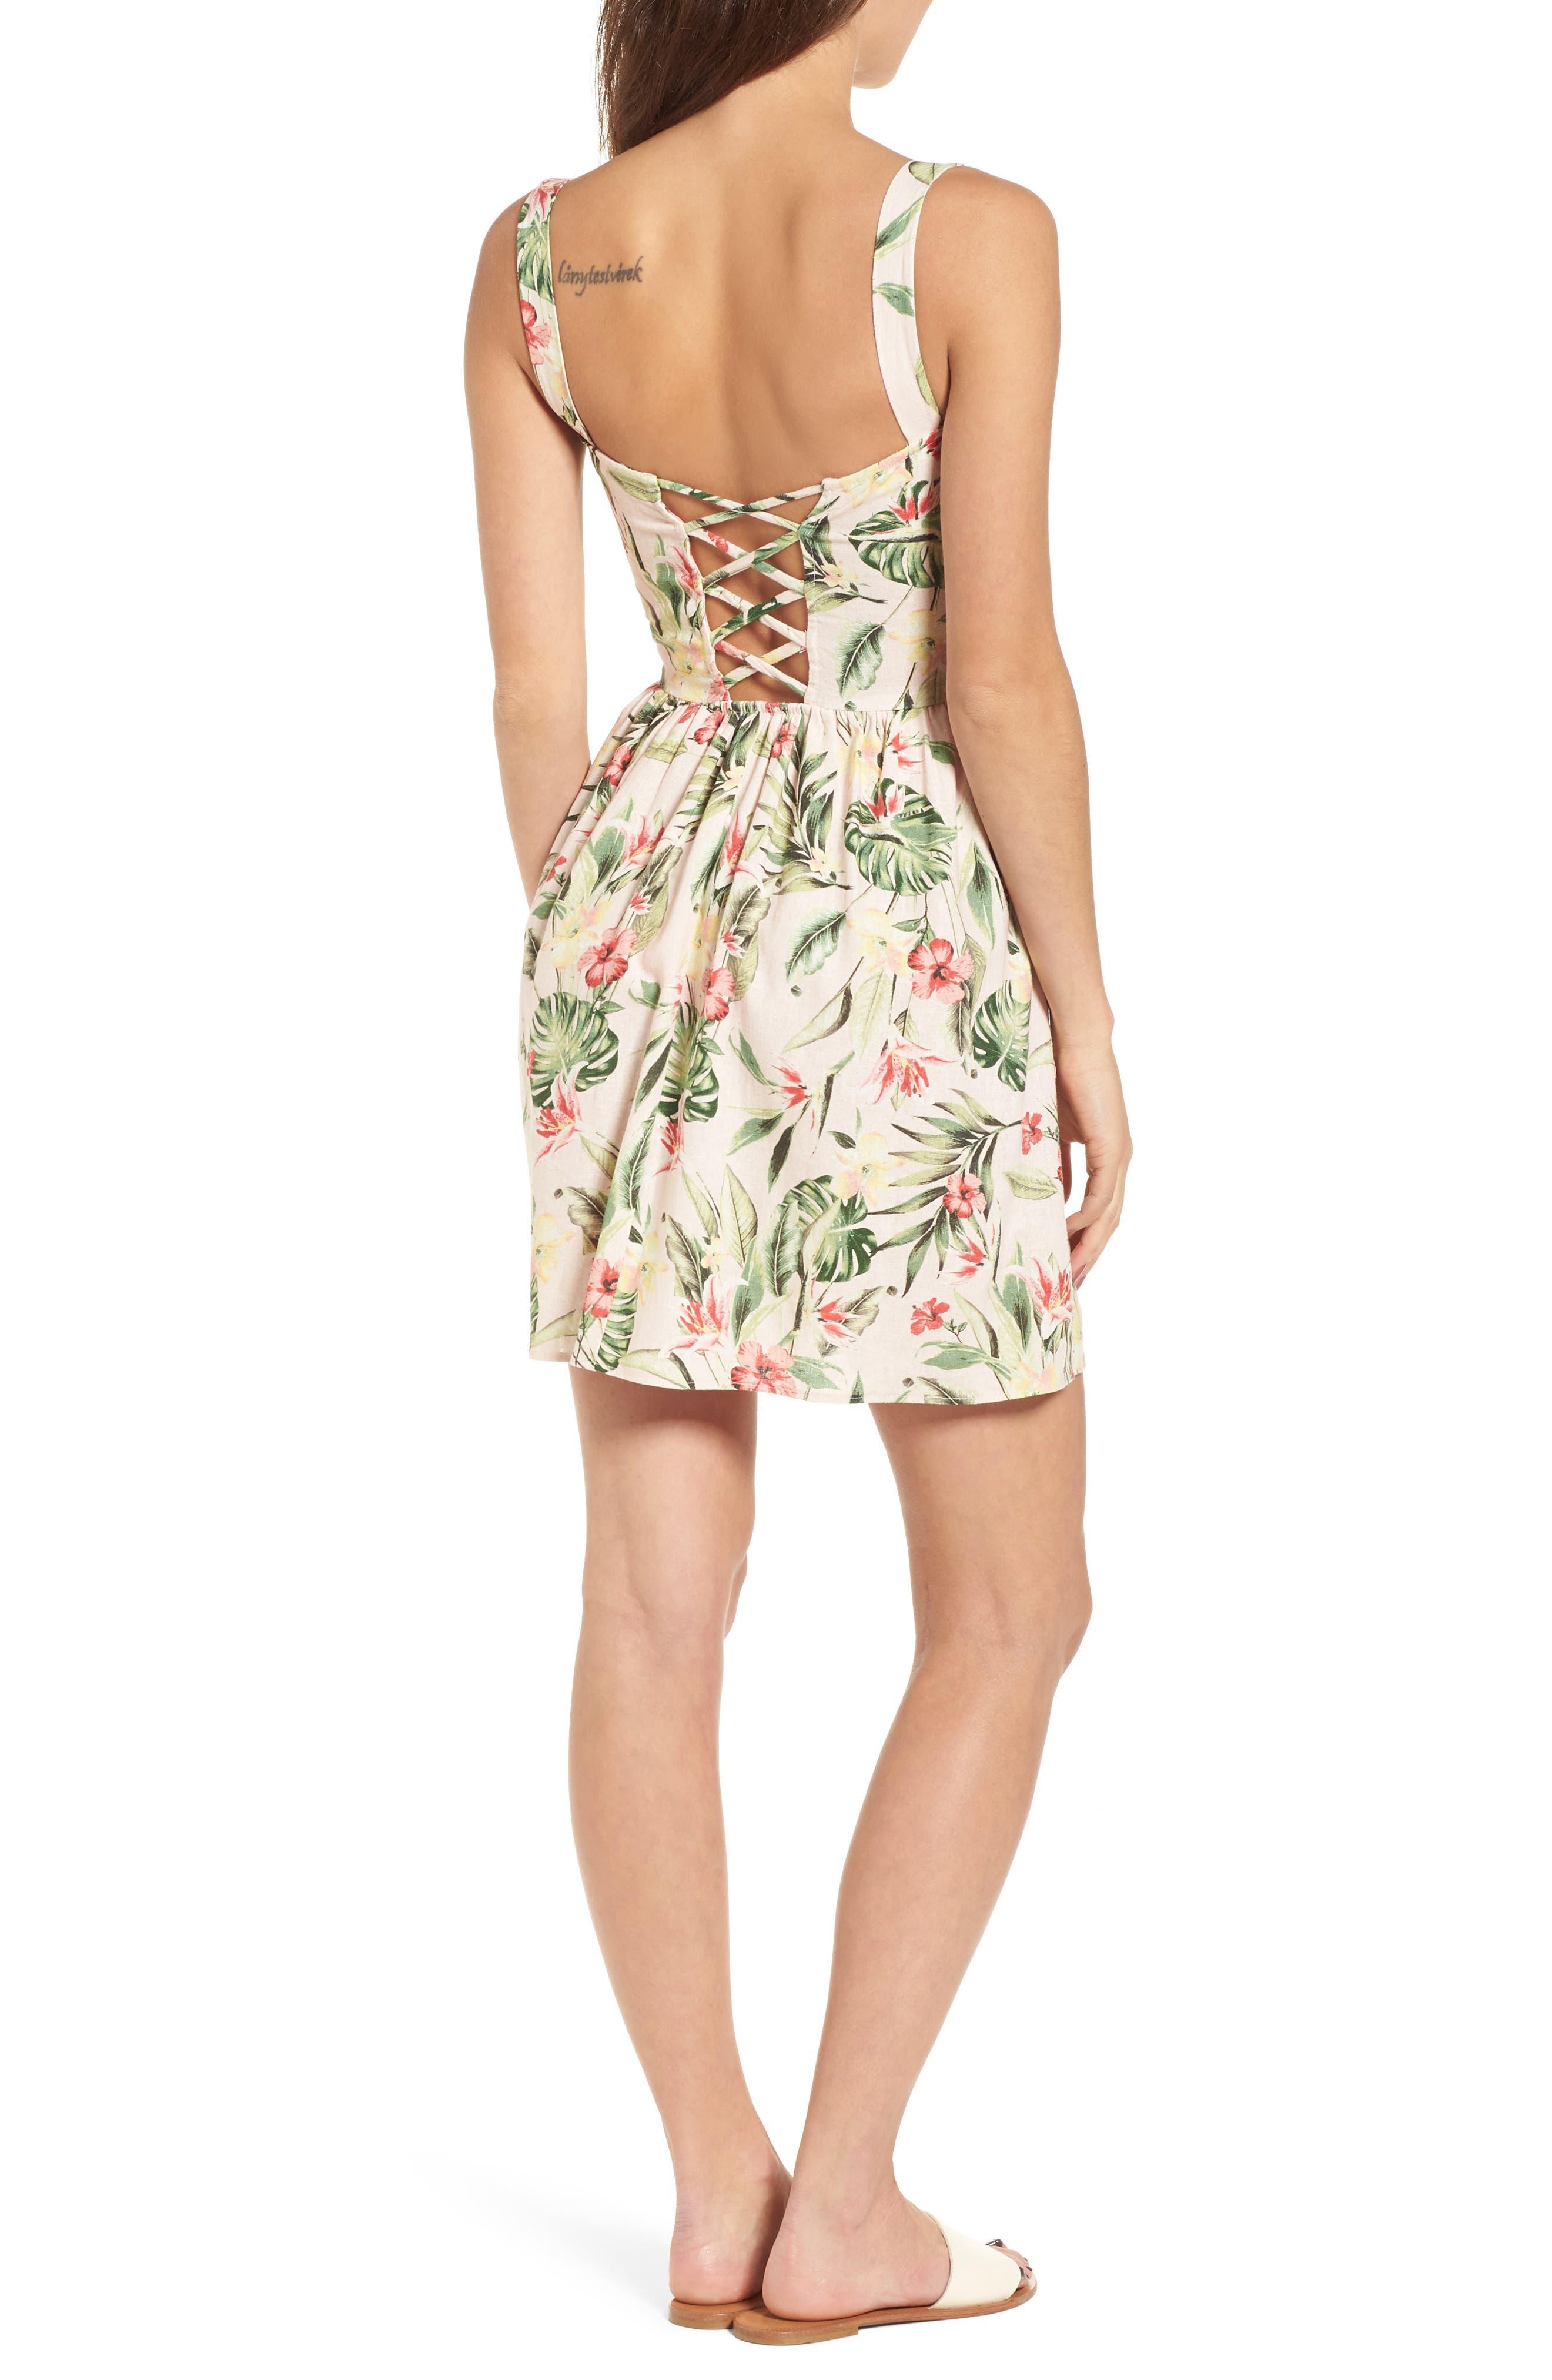 Tropical Lace Back Minidress,                             Alternate thumbnail 2, color,                             Blush/ Green